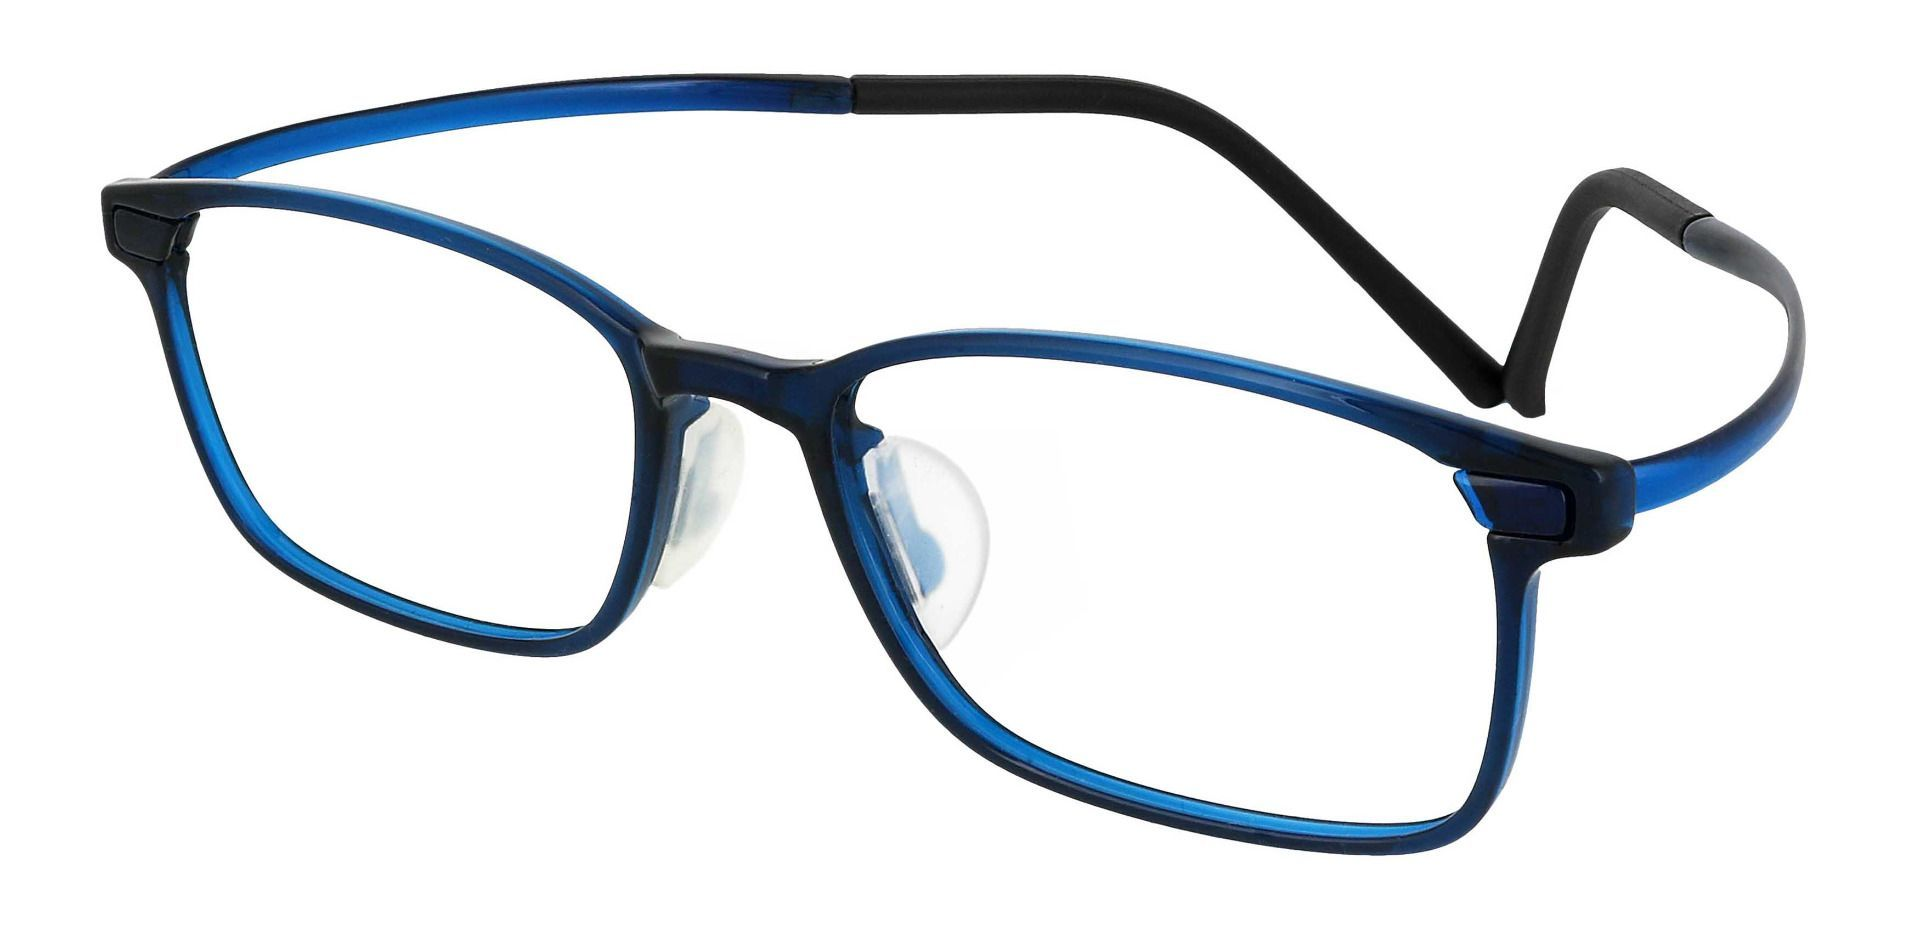 Weaver Rectangle Prescription Glasses - Blue